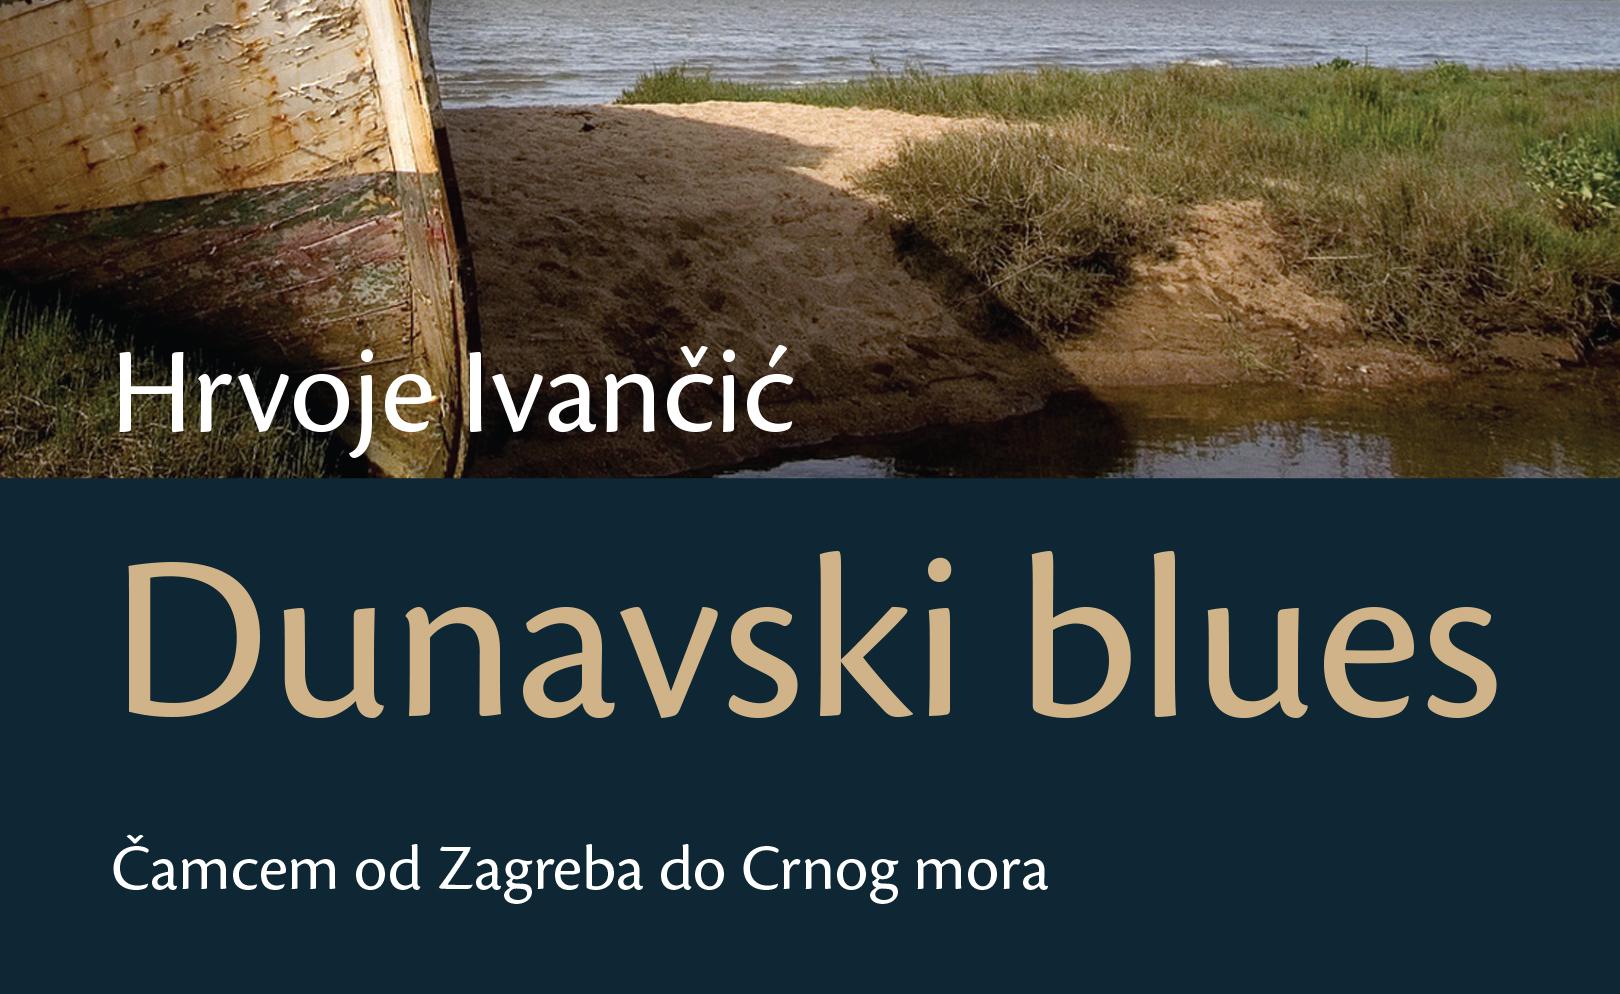 Dunavski blues naslovnica 2 izd.indd